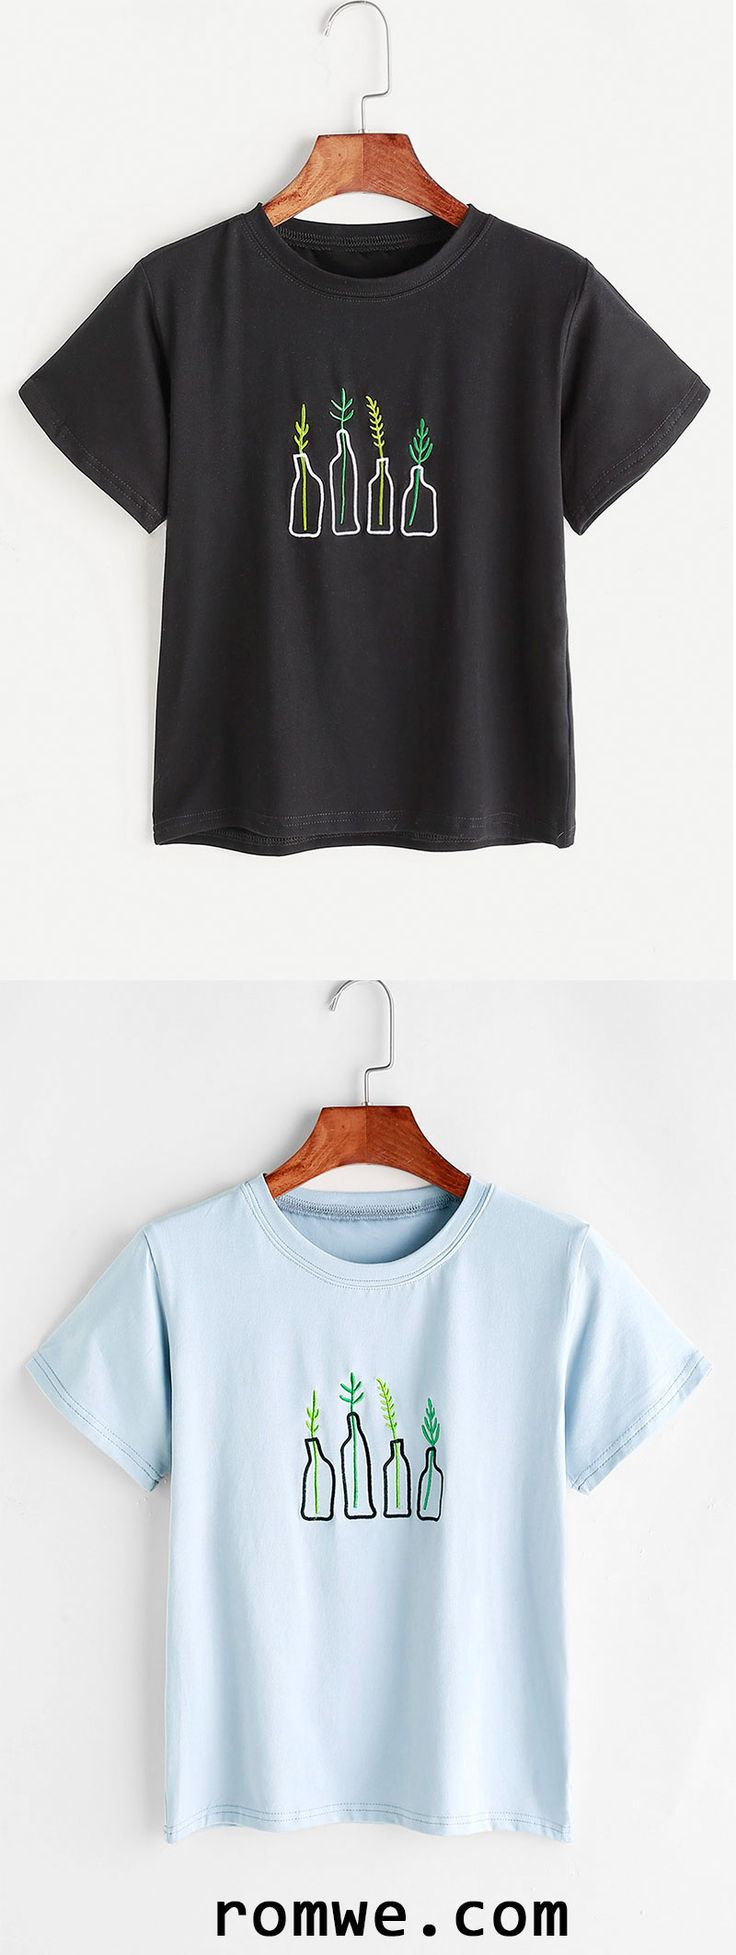 T shirt design york pa - Plant Embroidery T Shirt